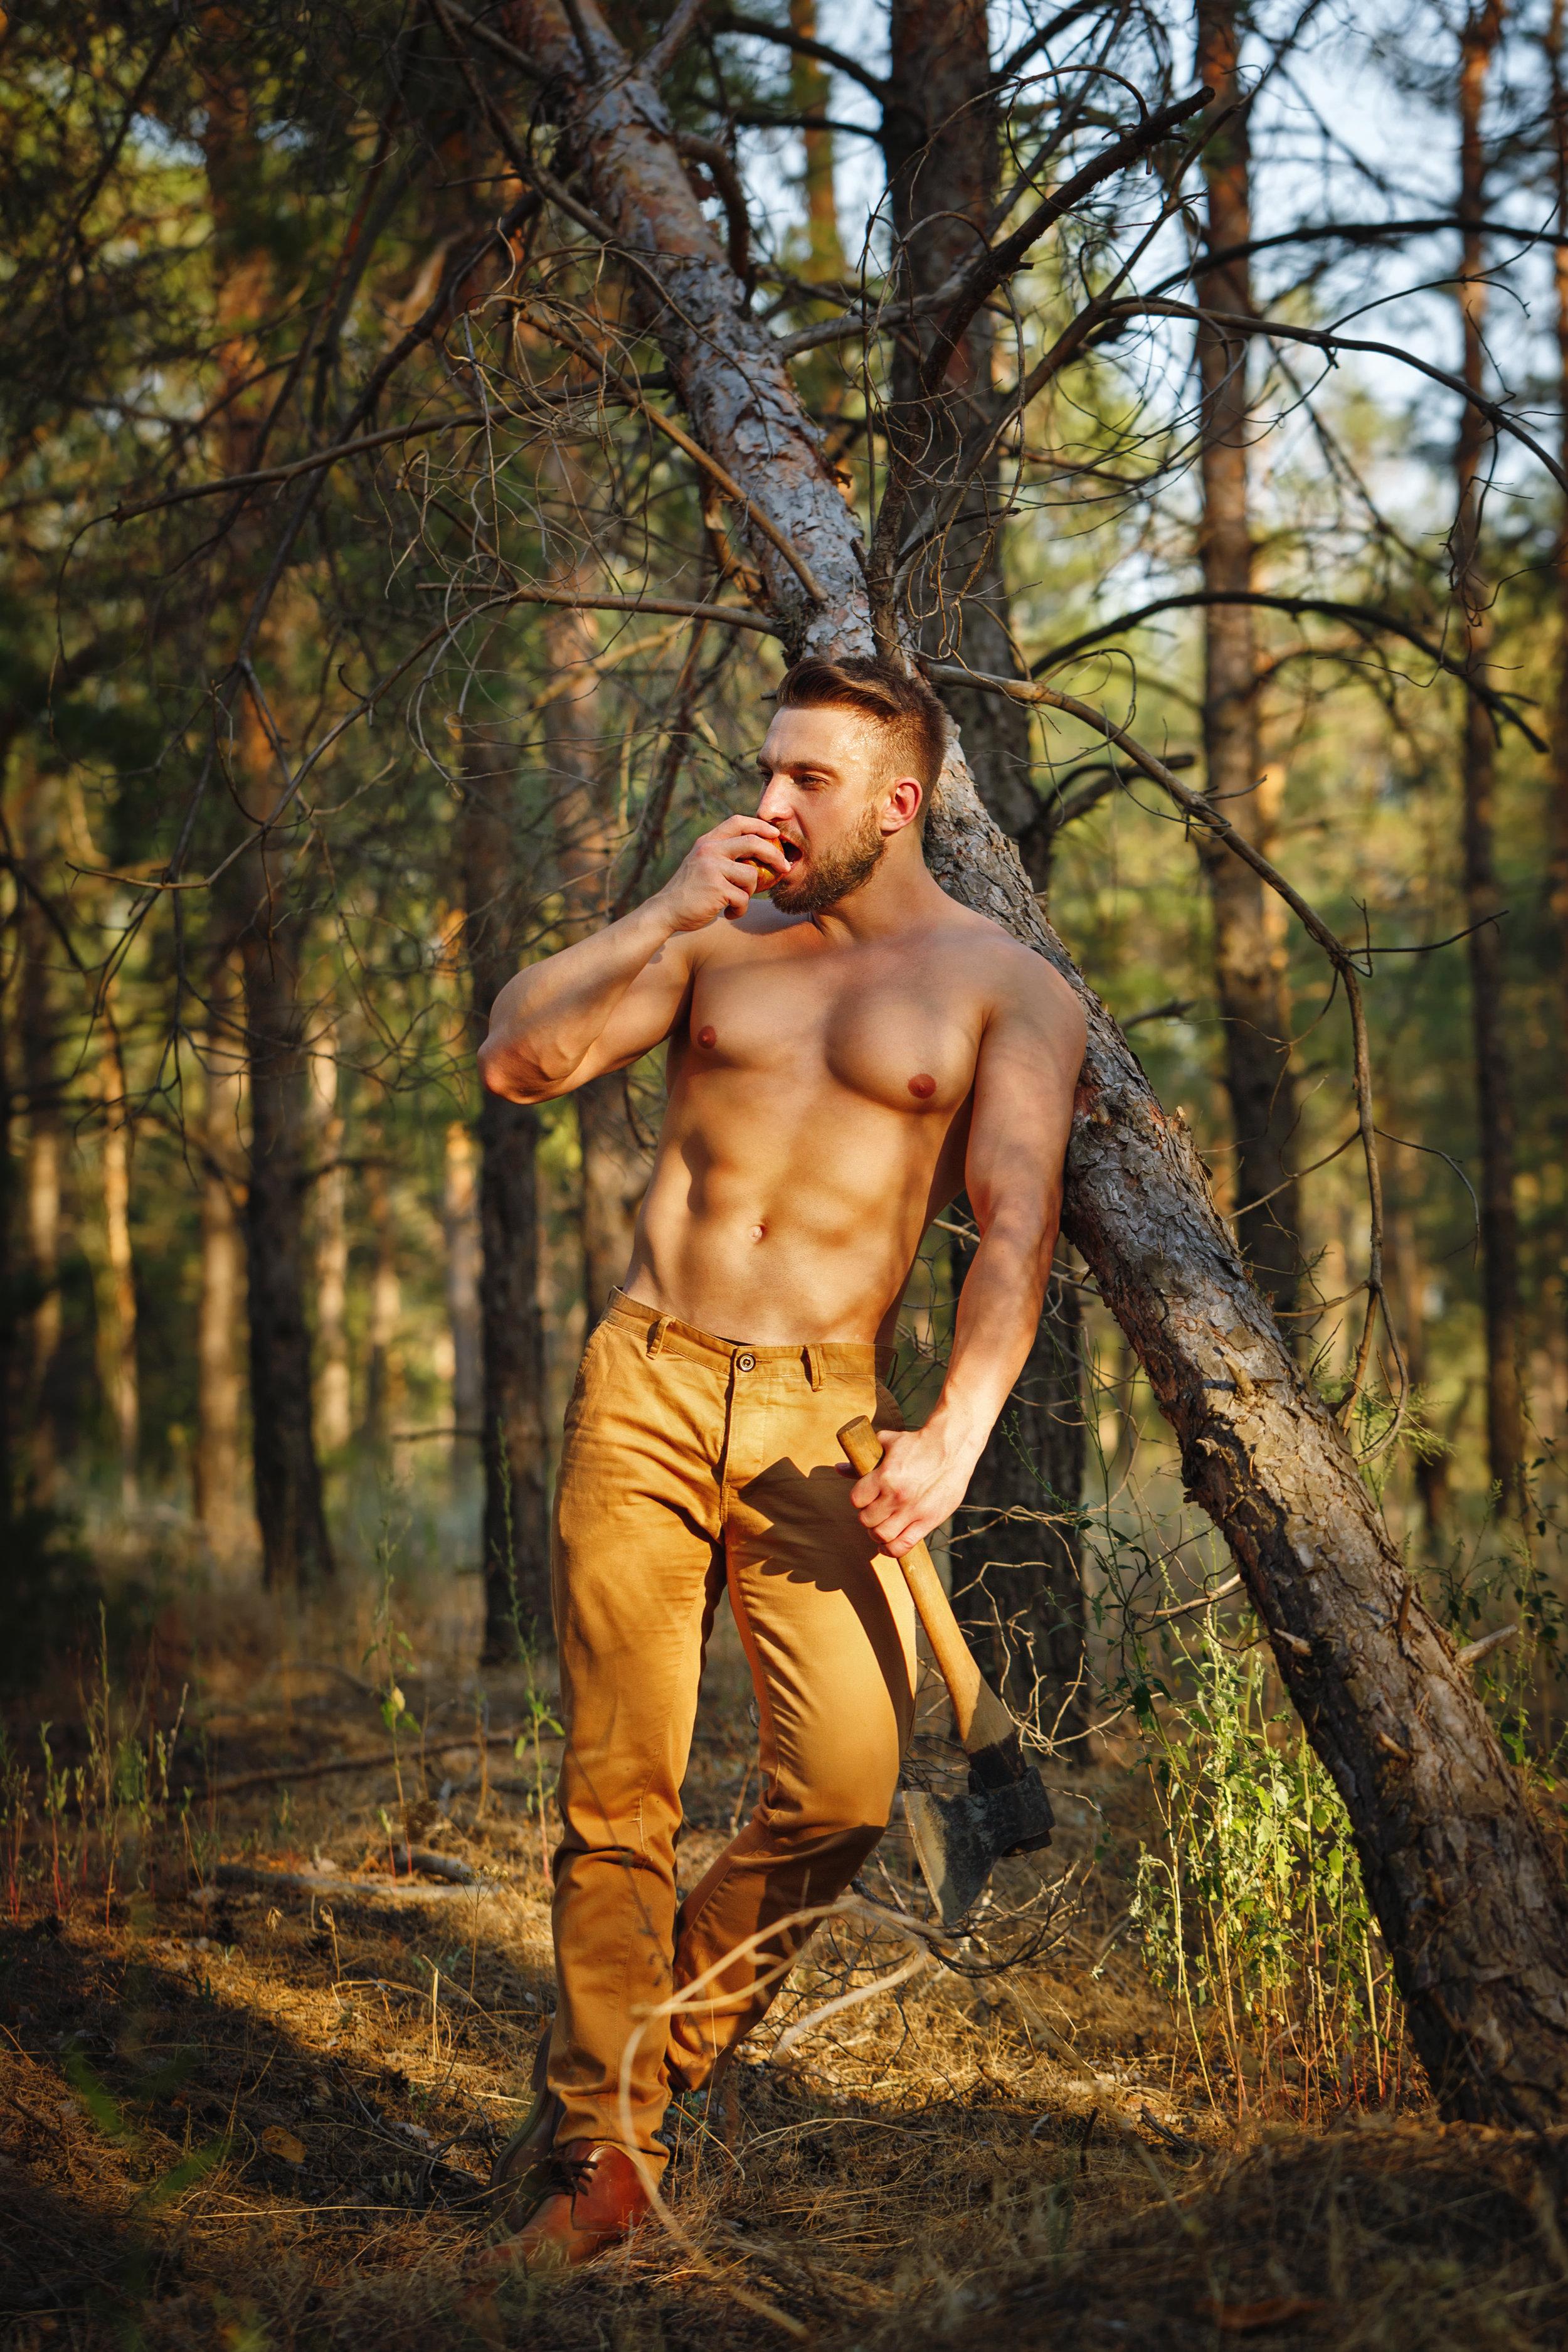 Lumberjack eating an apple.